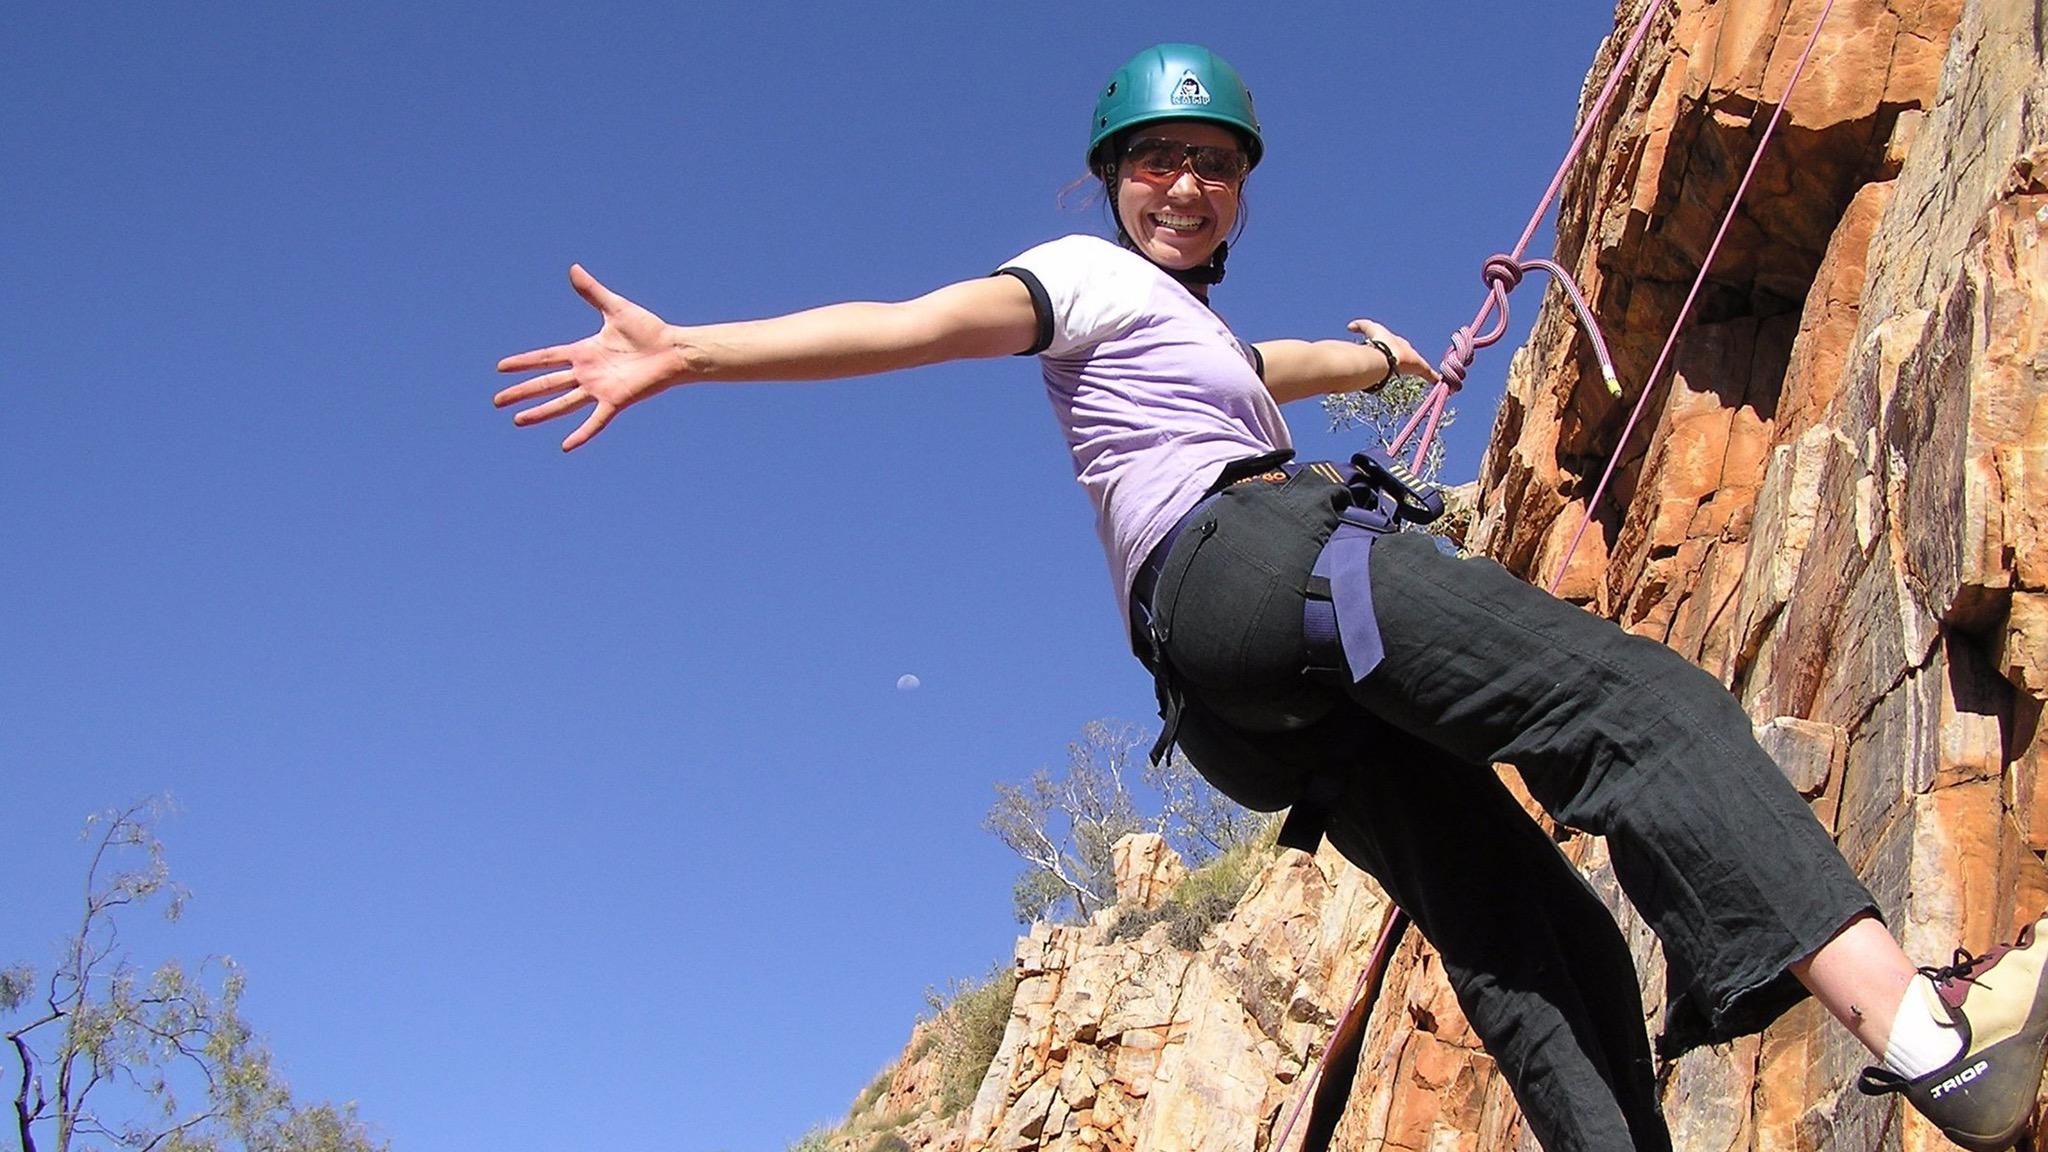 Grampians Mountain Adventure Company